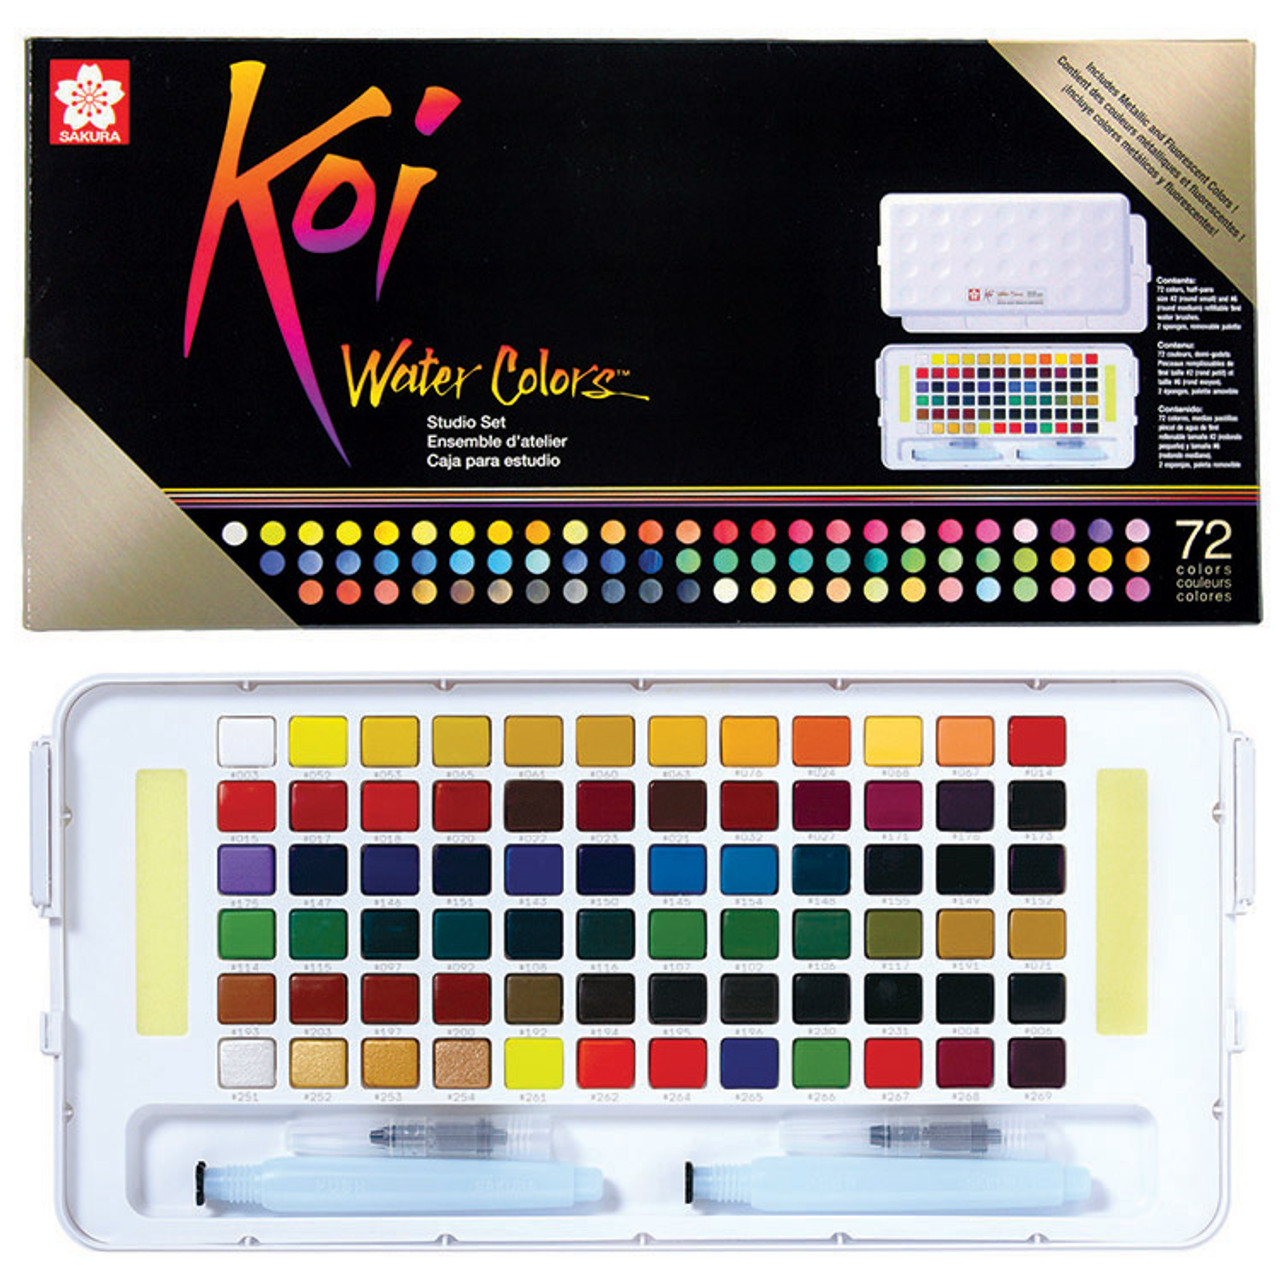 KOI Watercolor Studio 72-color Set